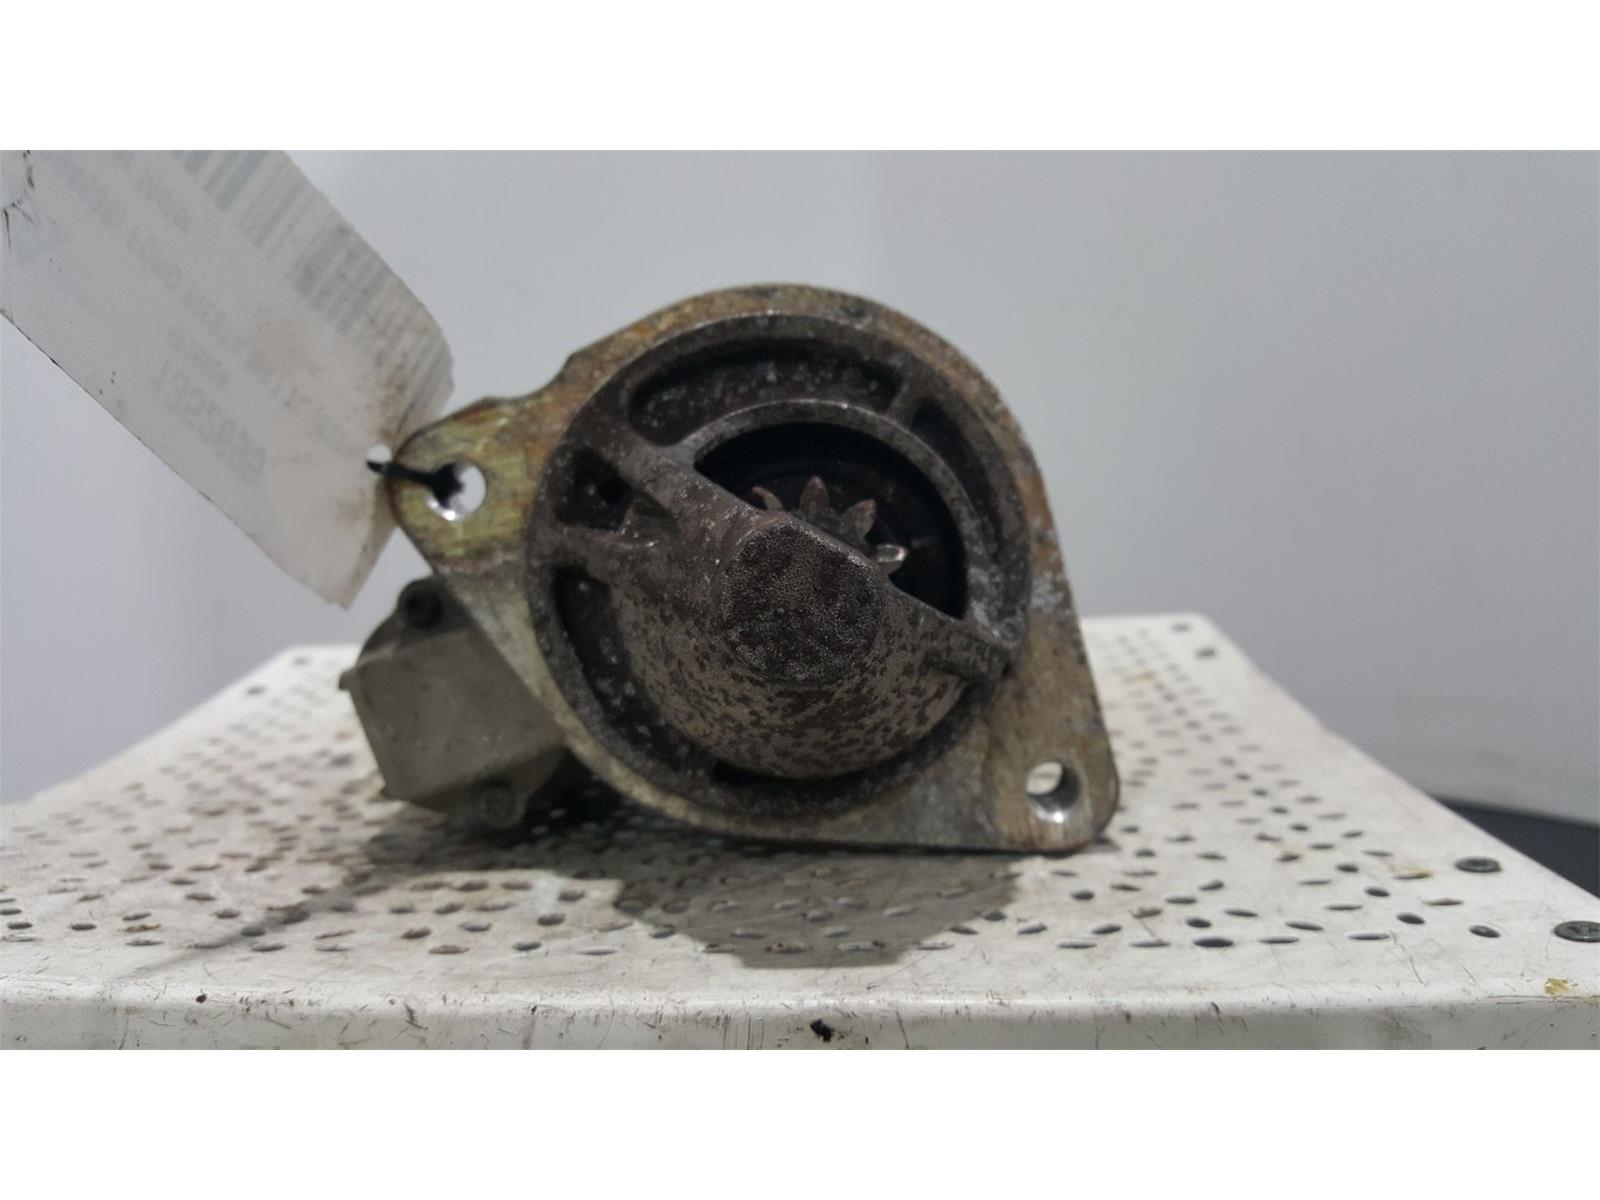 FORD FIESTA ST-LINE MK7 FL (B299) 2008 TO 2017 - 1.0 PETROL Starter Motor